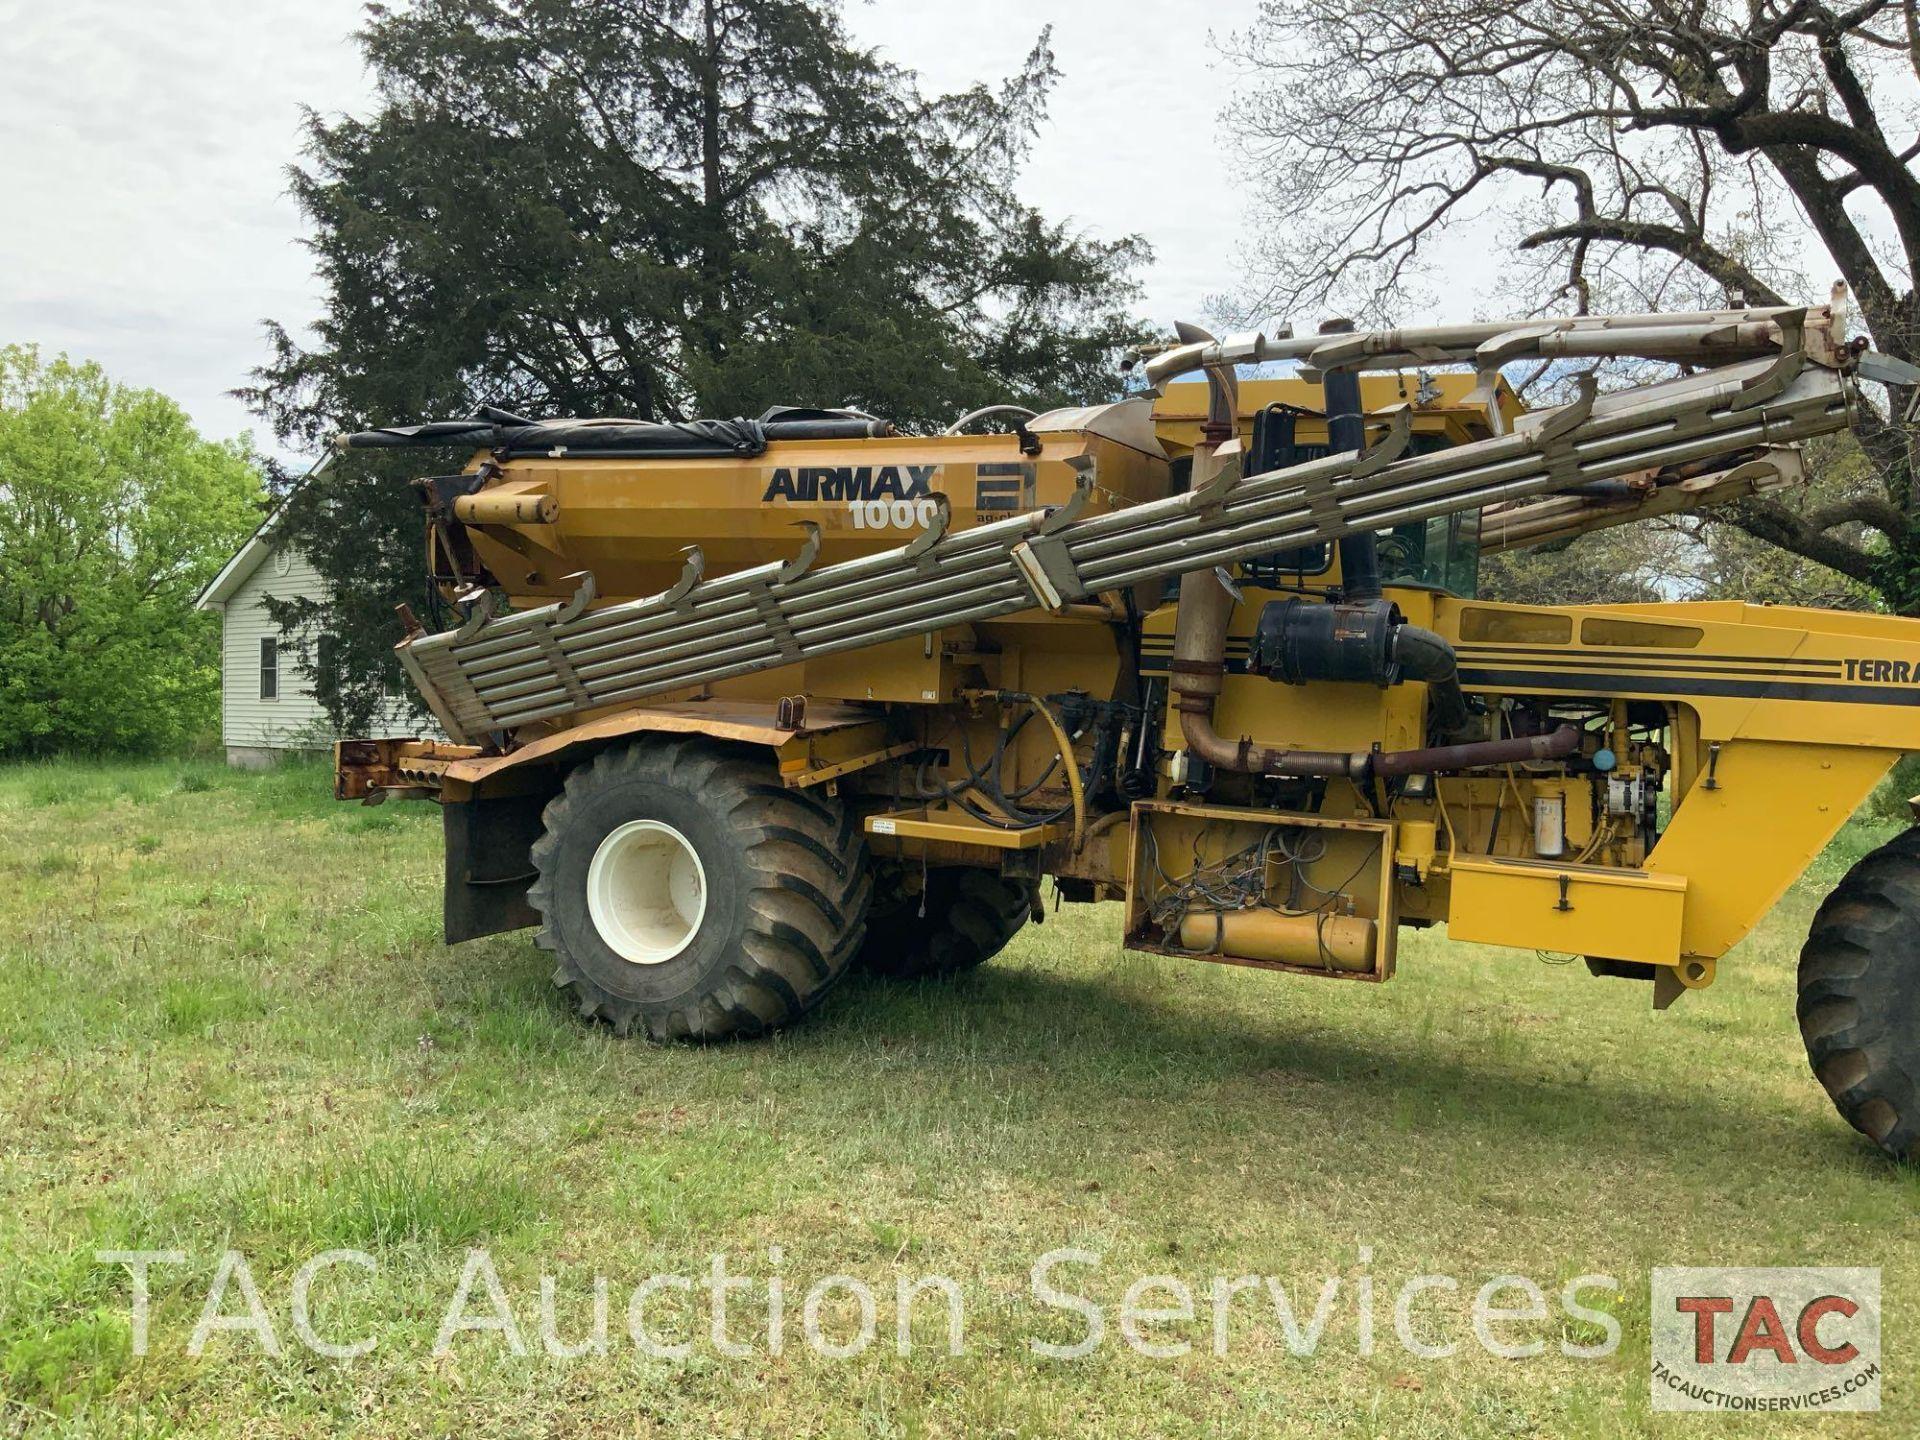 AirMax 1000 Dry Fertilizer Spreader - Image 8 of 30